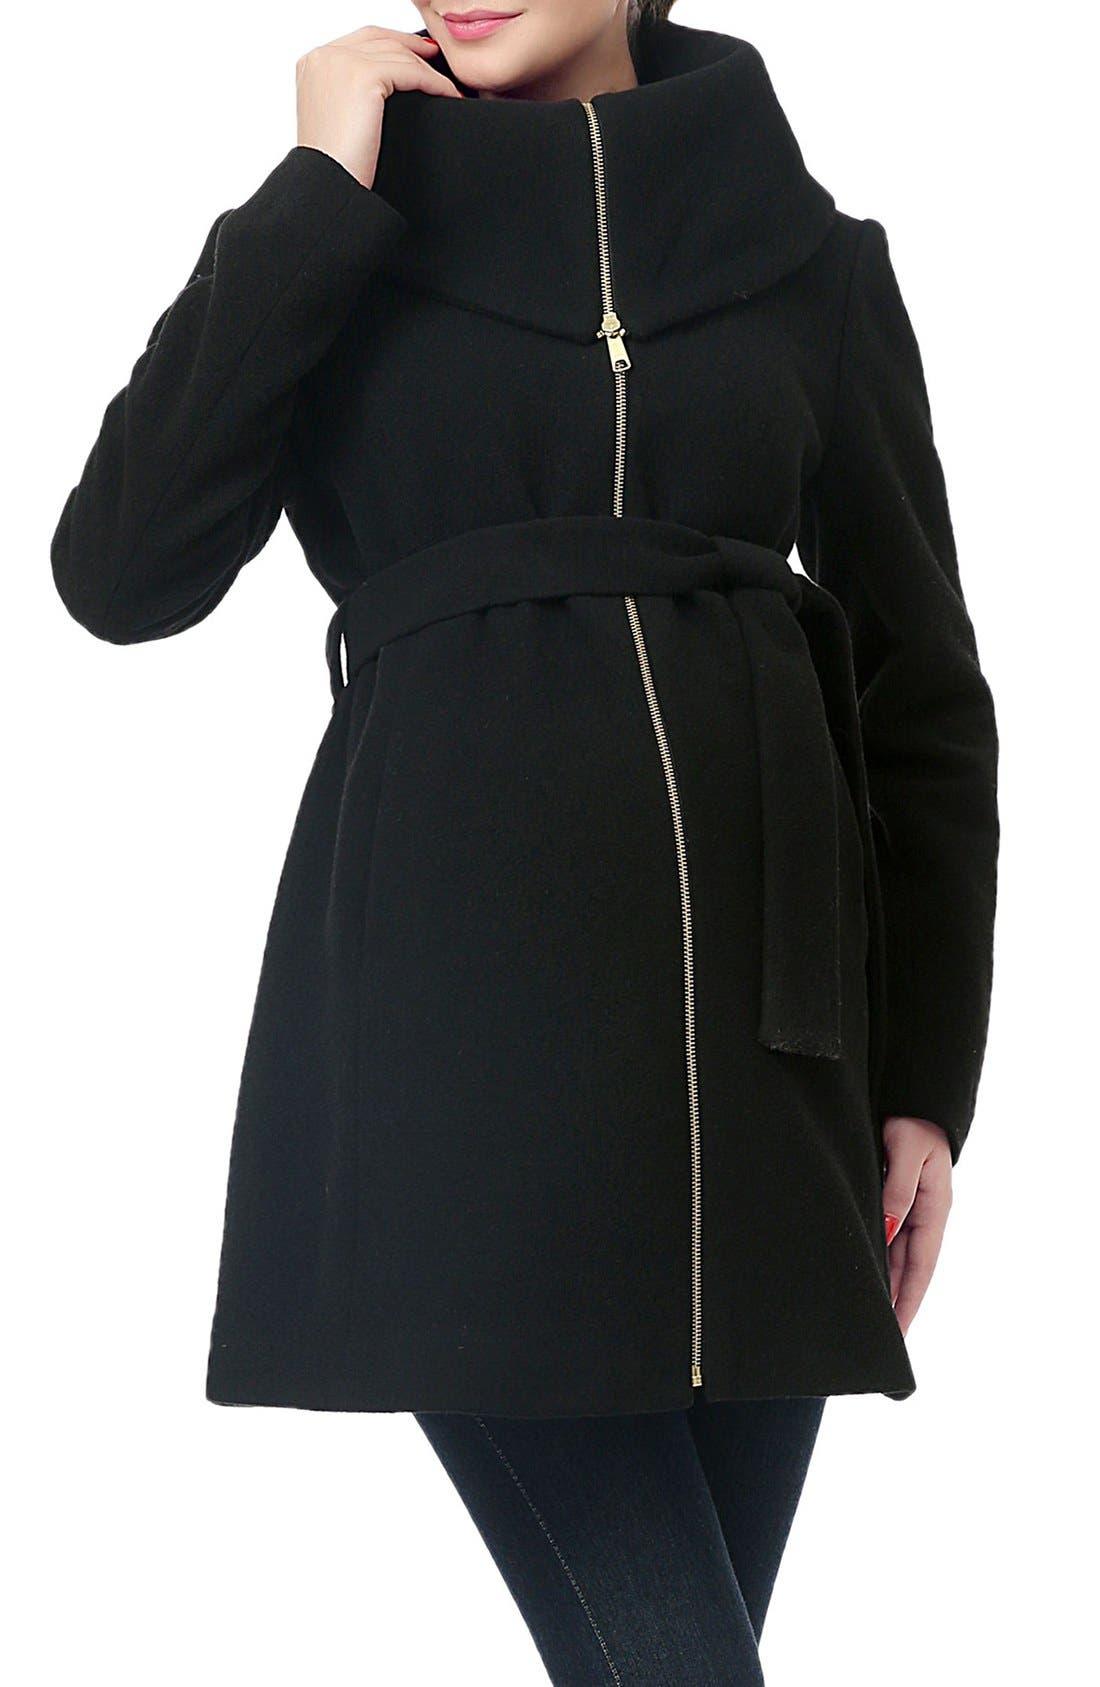 'Mia' High Collar Maternity Coat,                             Main thumbnail 1, color,                             001